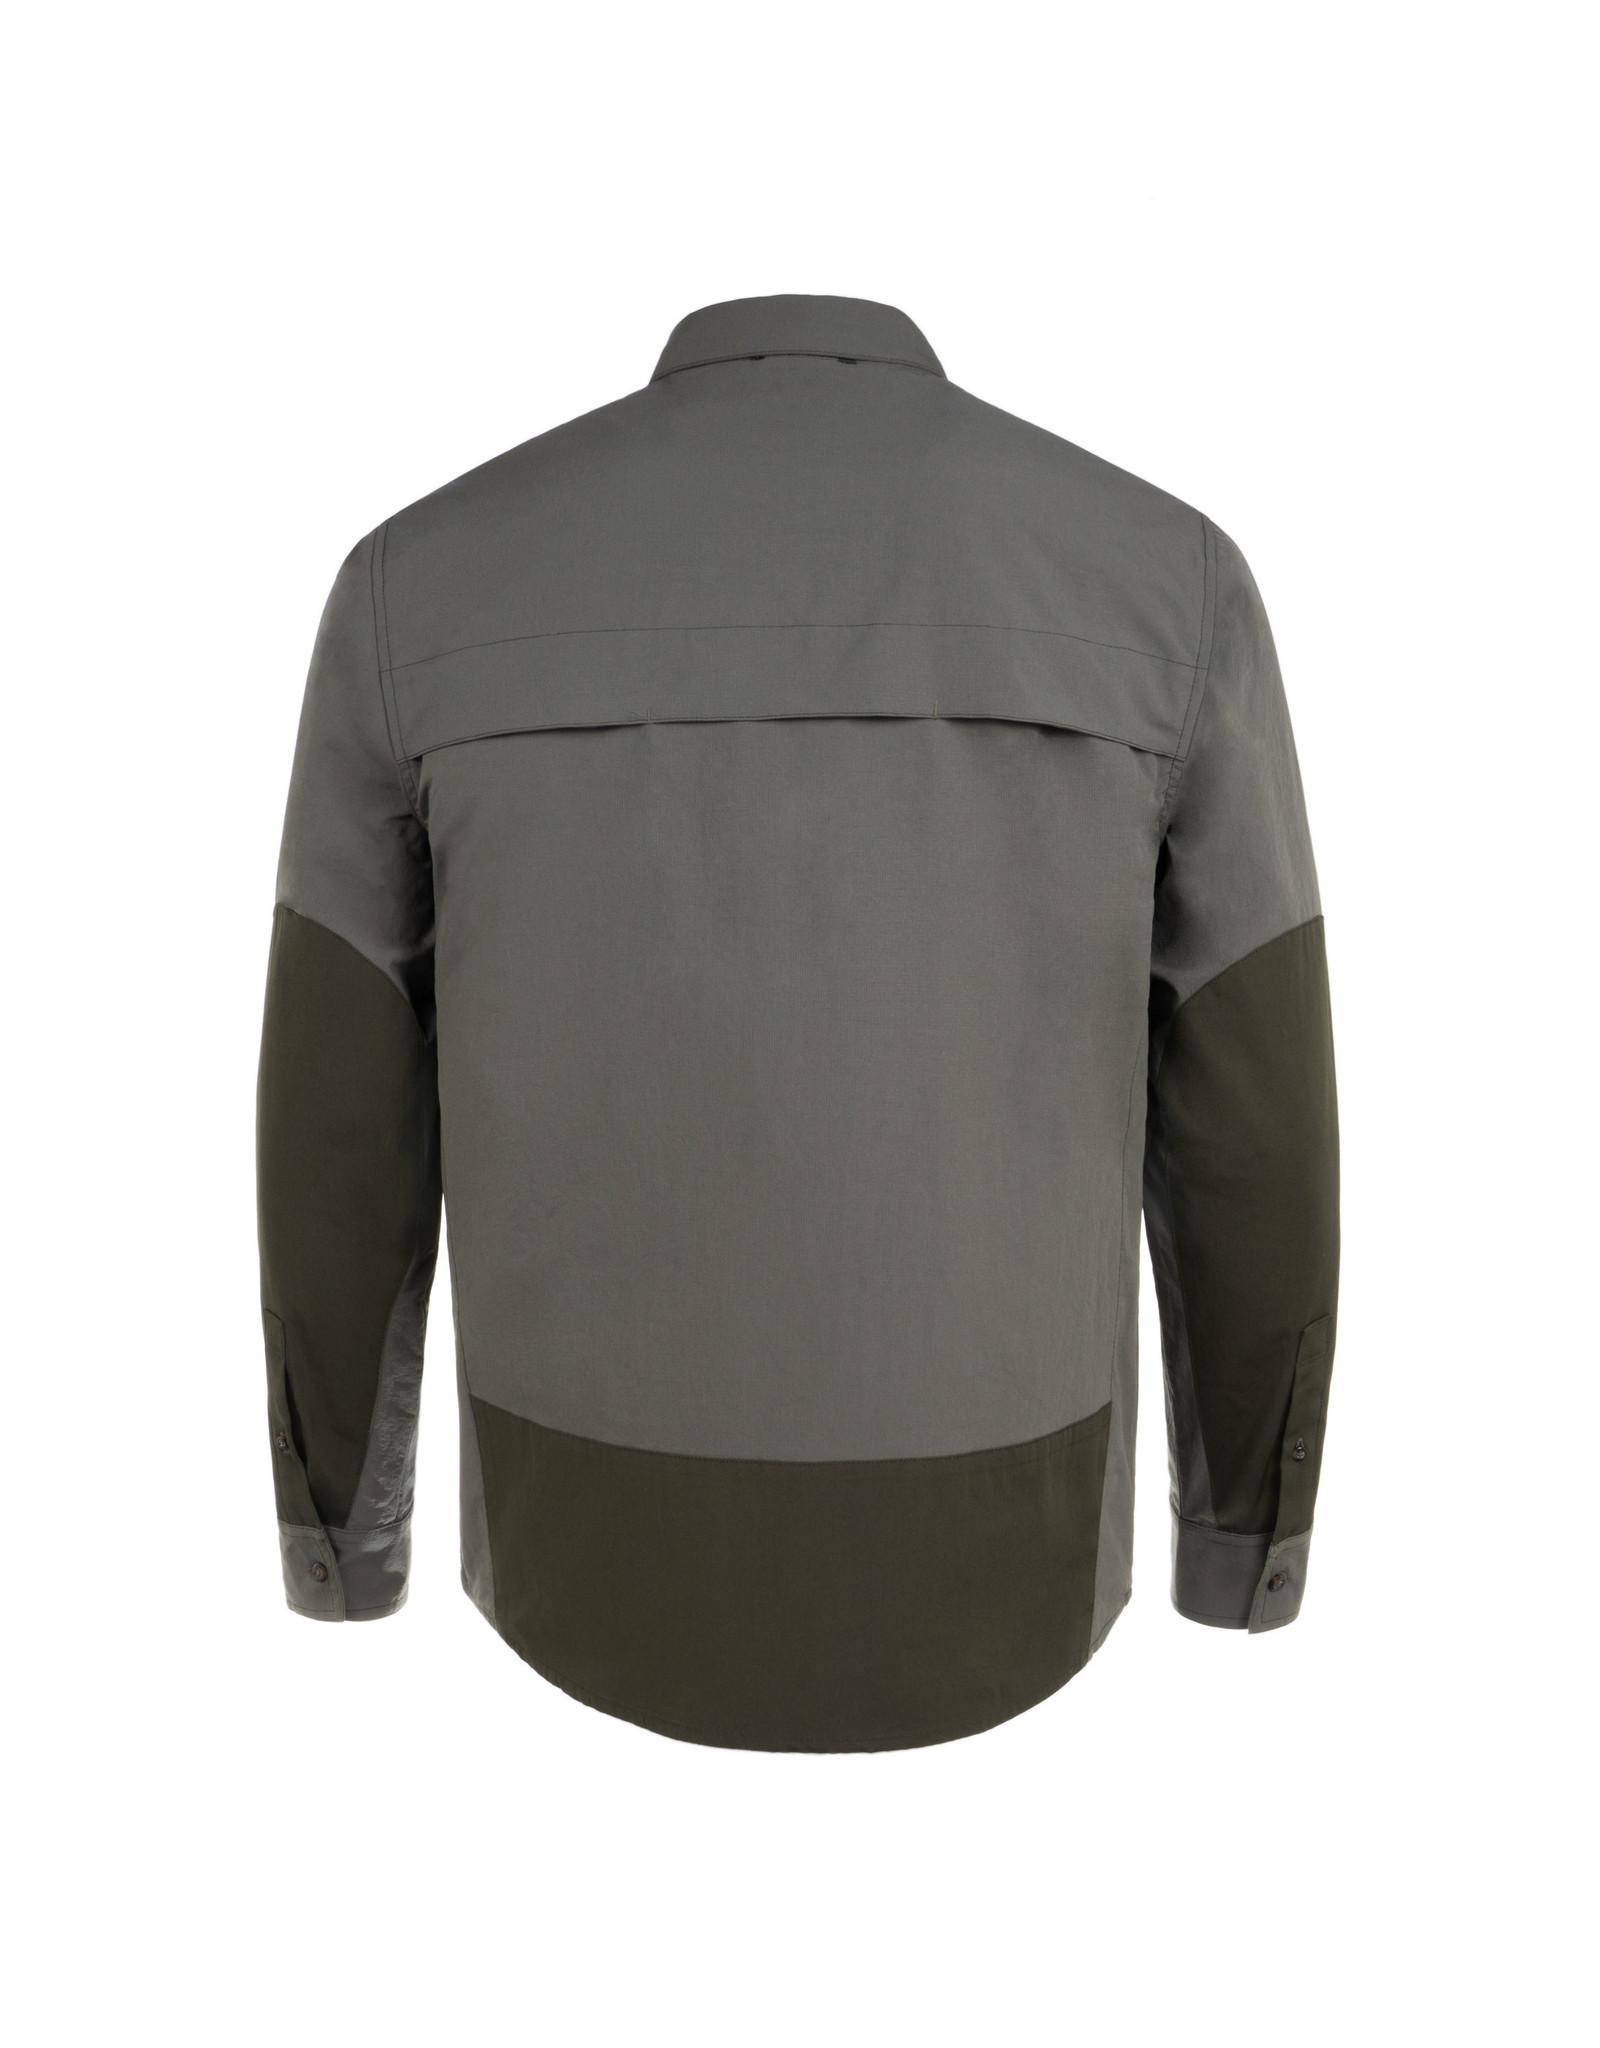 Hooké Hooké Field Shirt